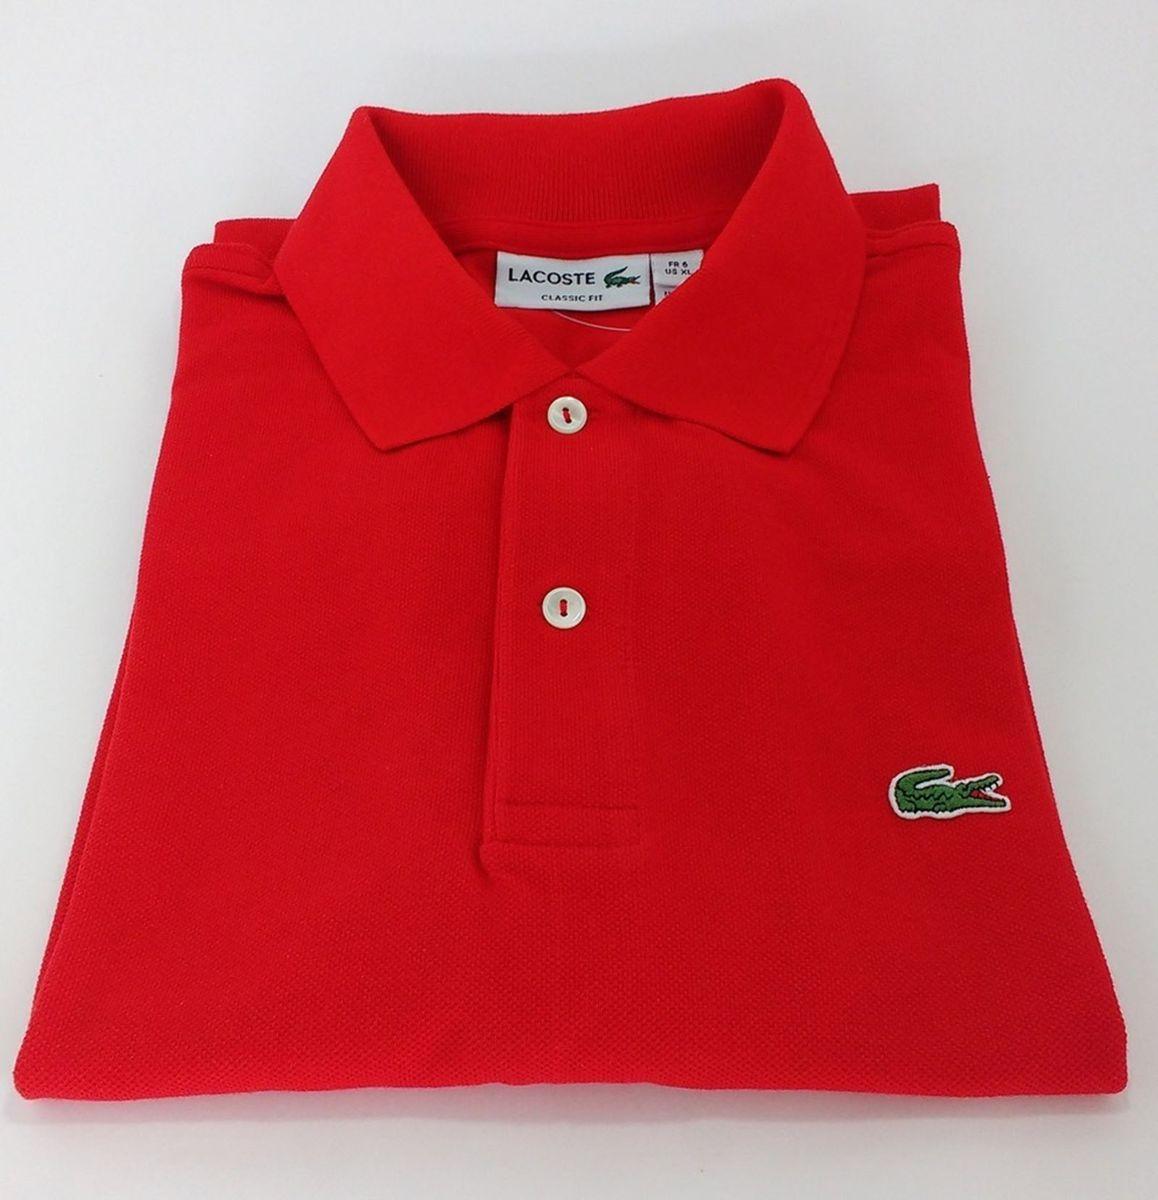 camisa polo lacoste masculina tamanho g - camisas lacoste